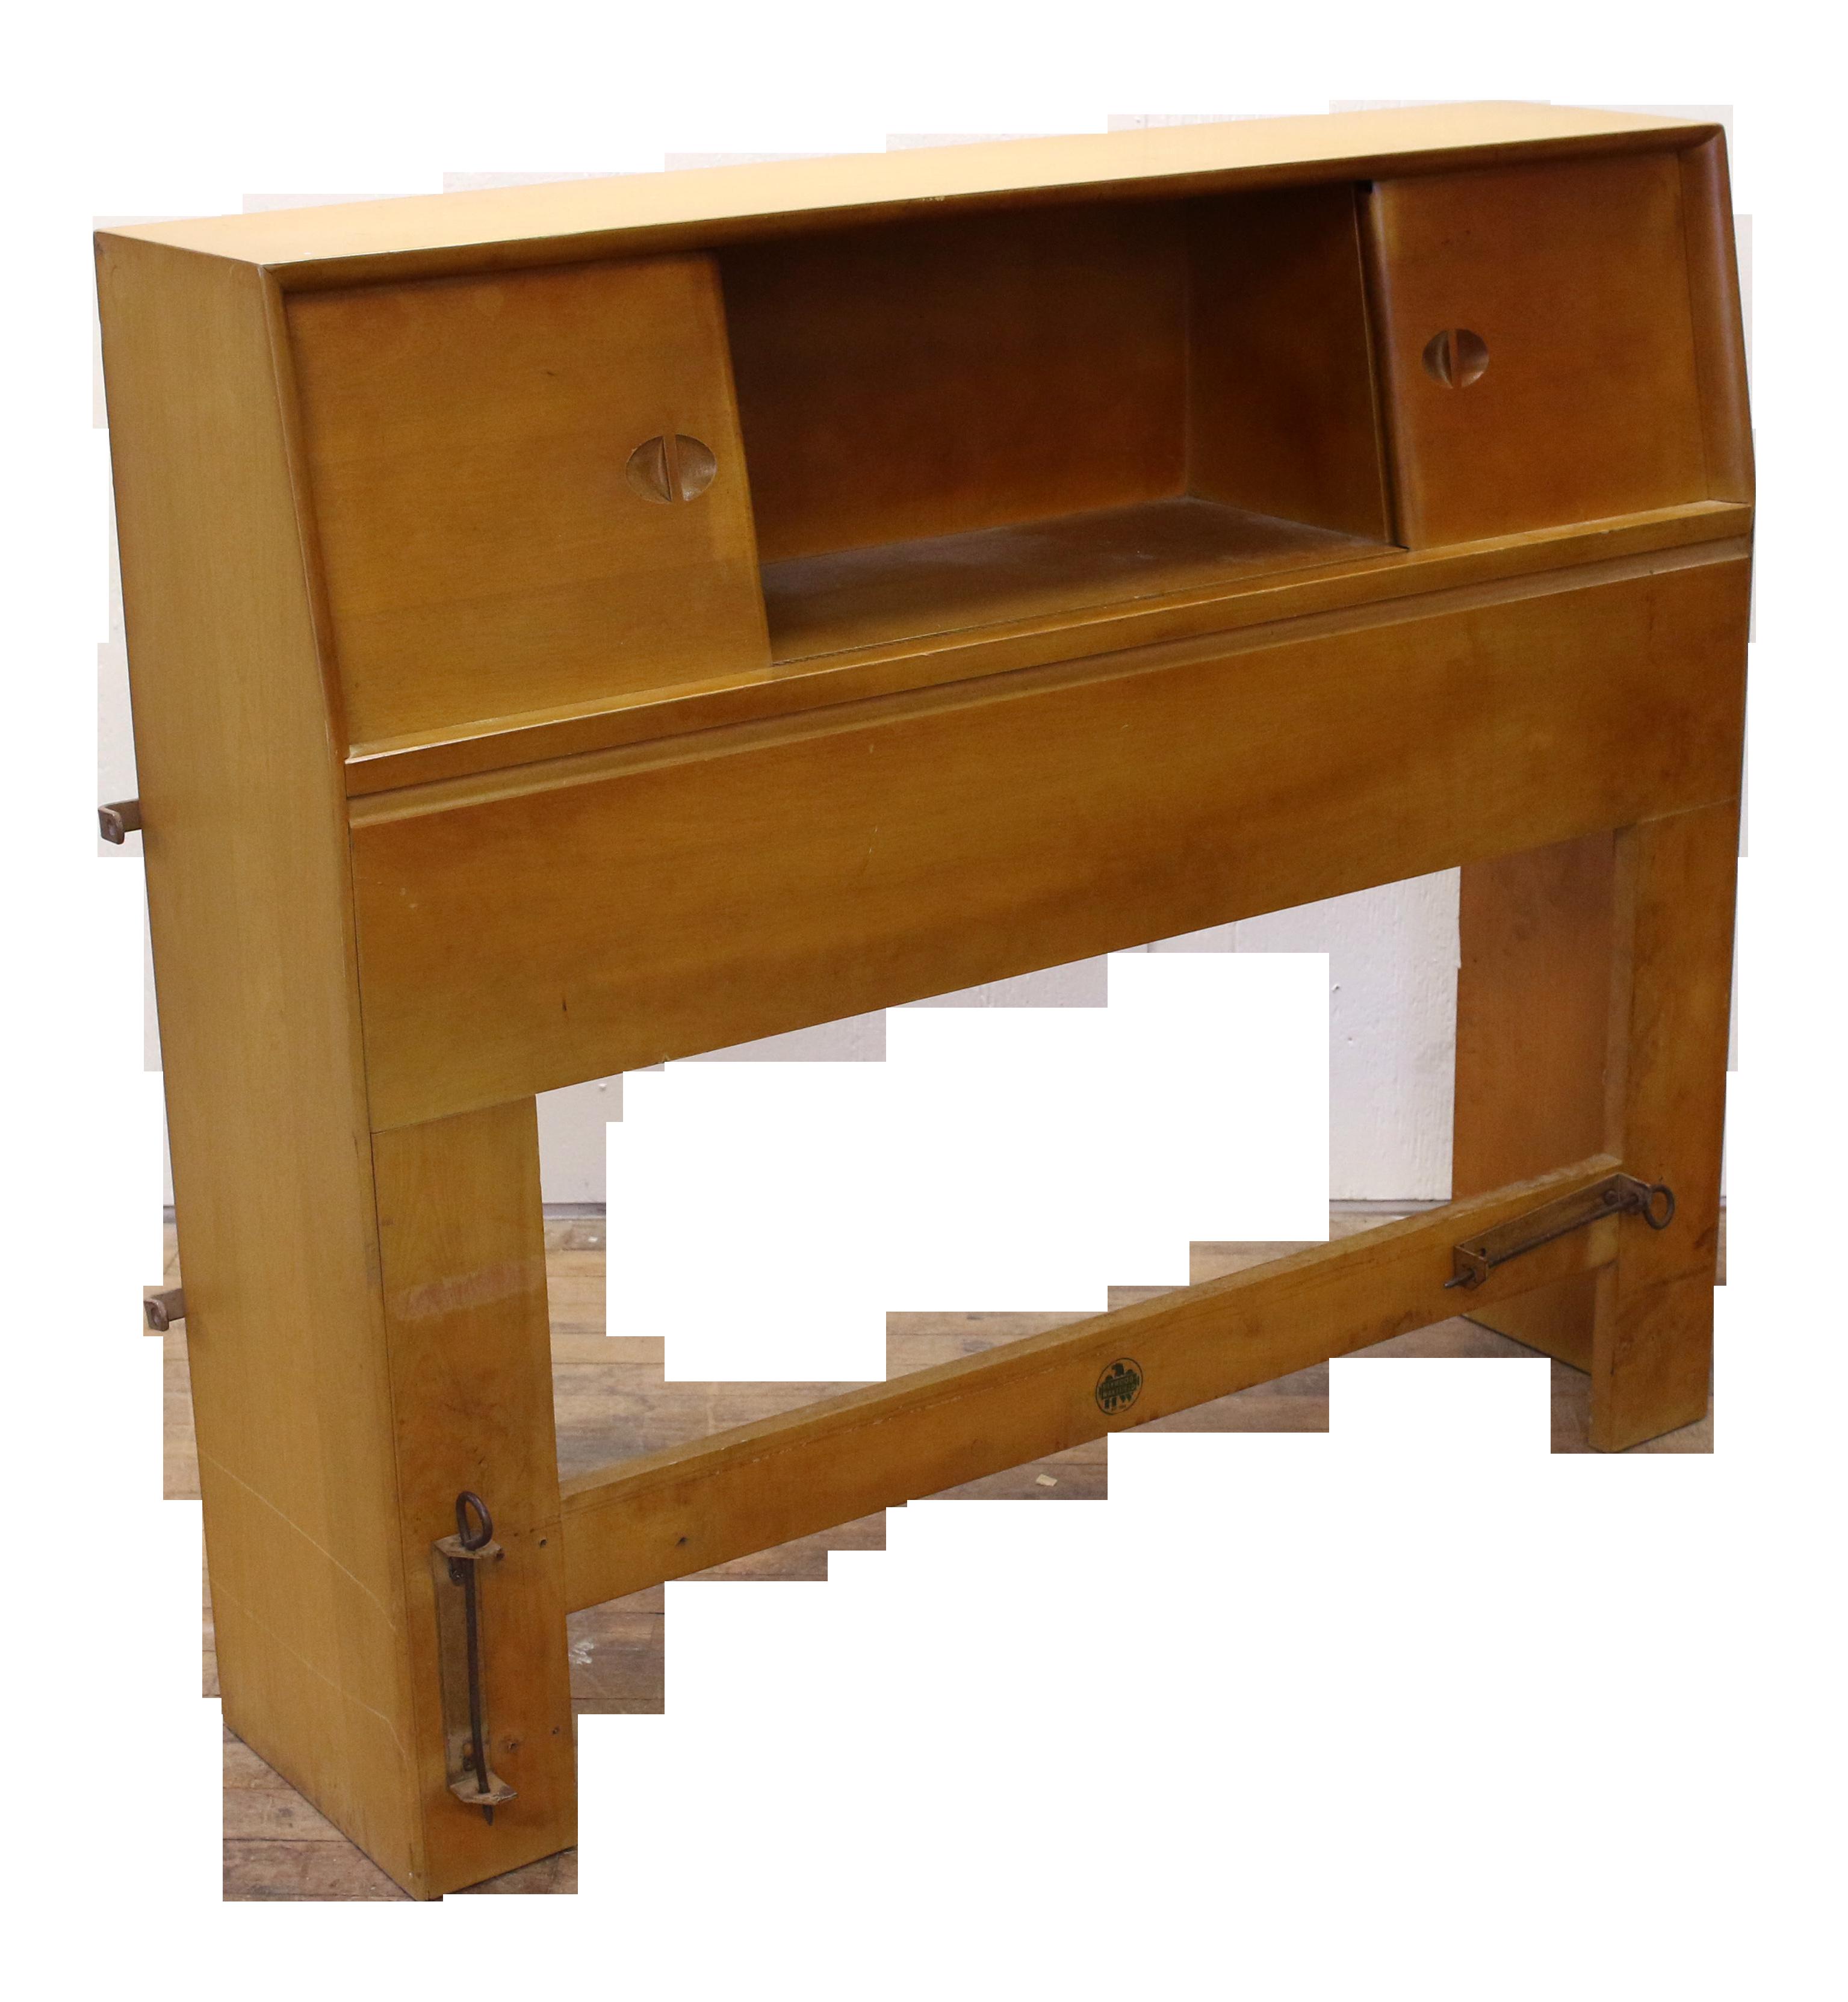 Image of: 1961 Mid Century Modern Heywood Wakefield Twin Bed Bookshelf Headboard Chairish